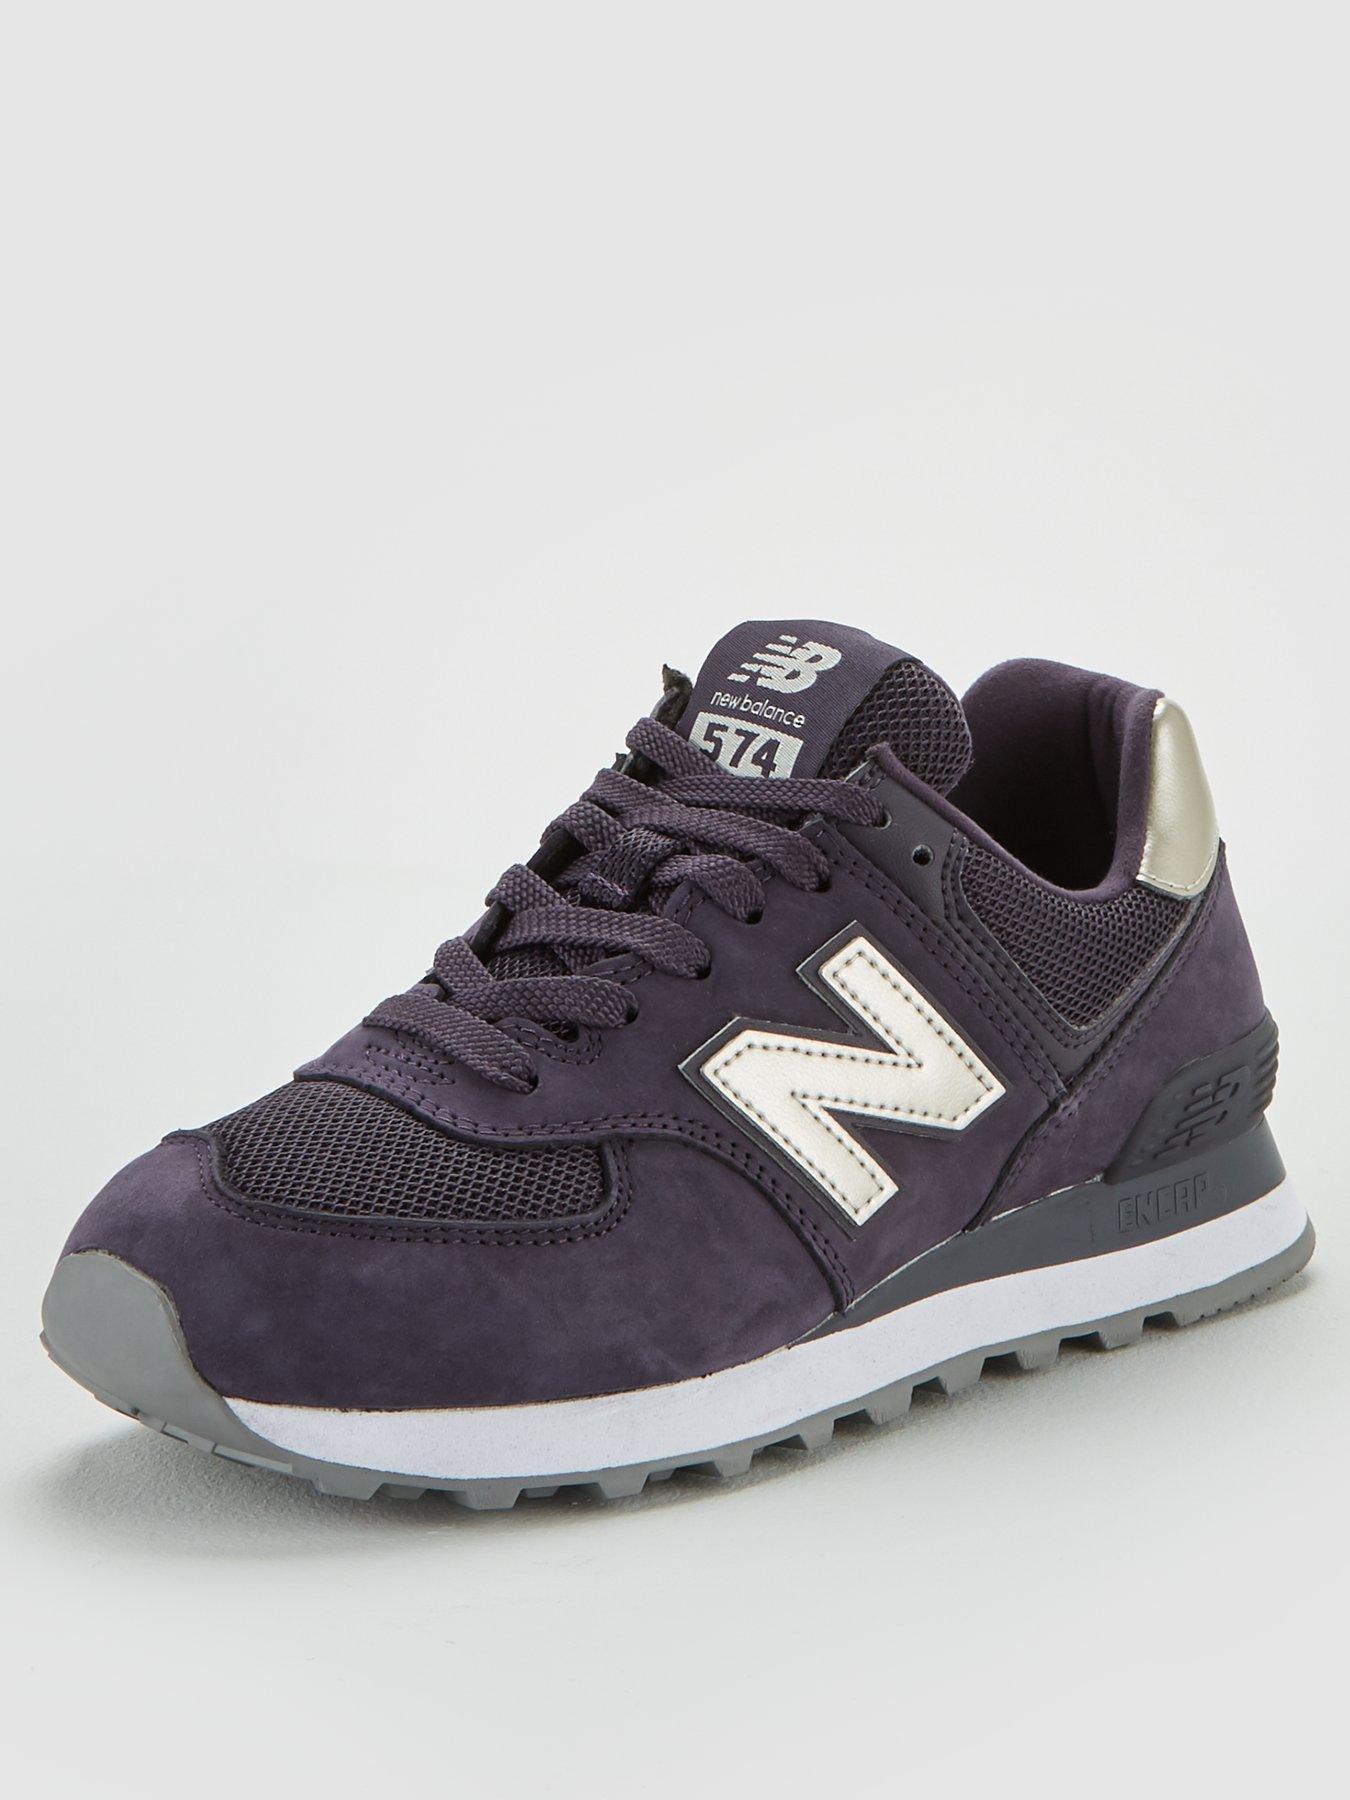 size 3 new balance 574